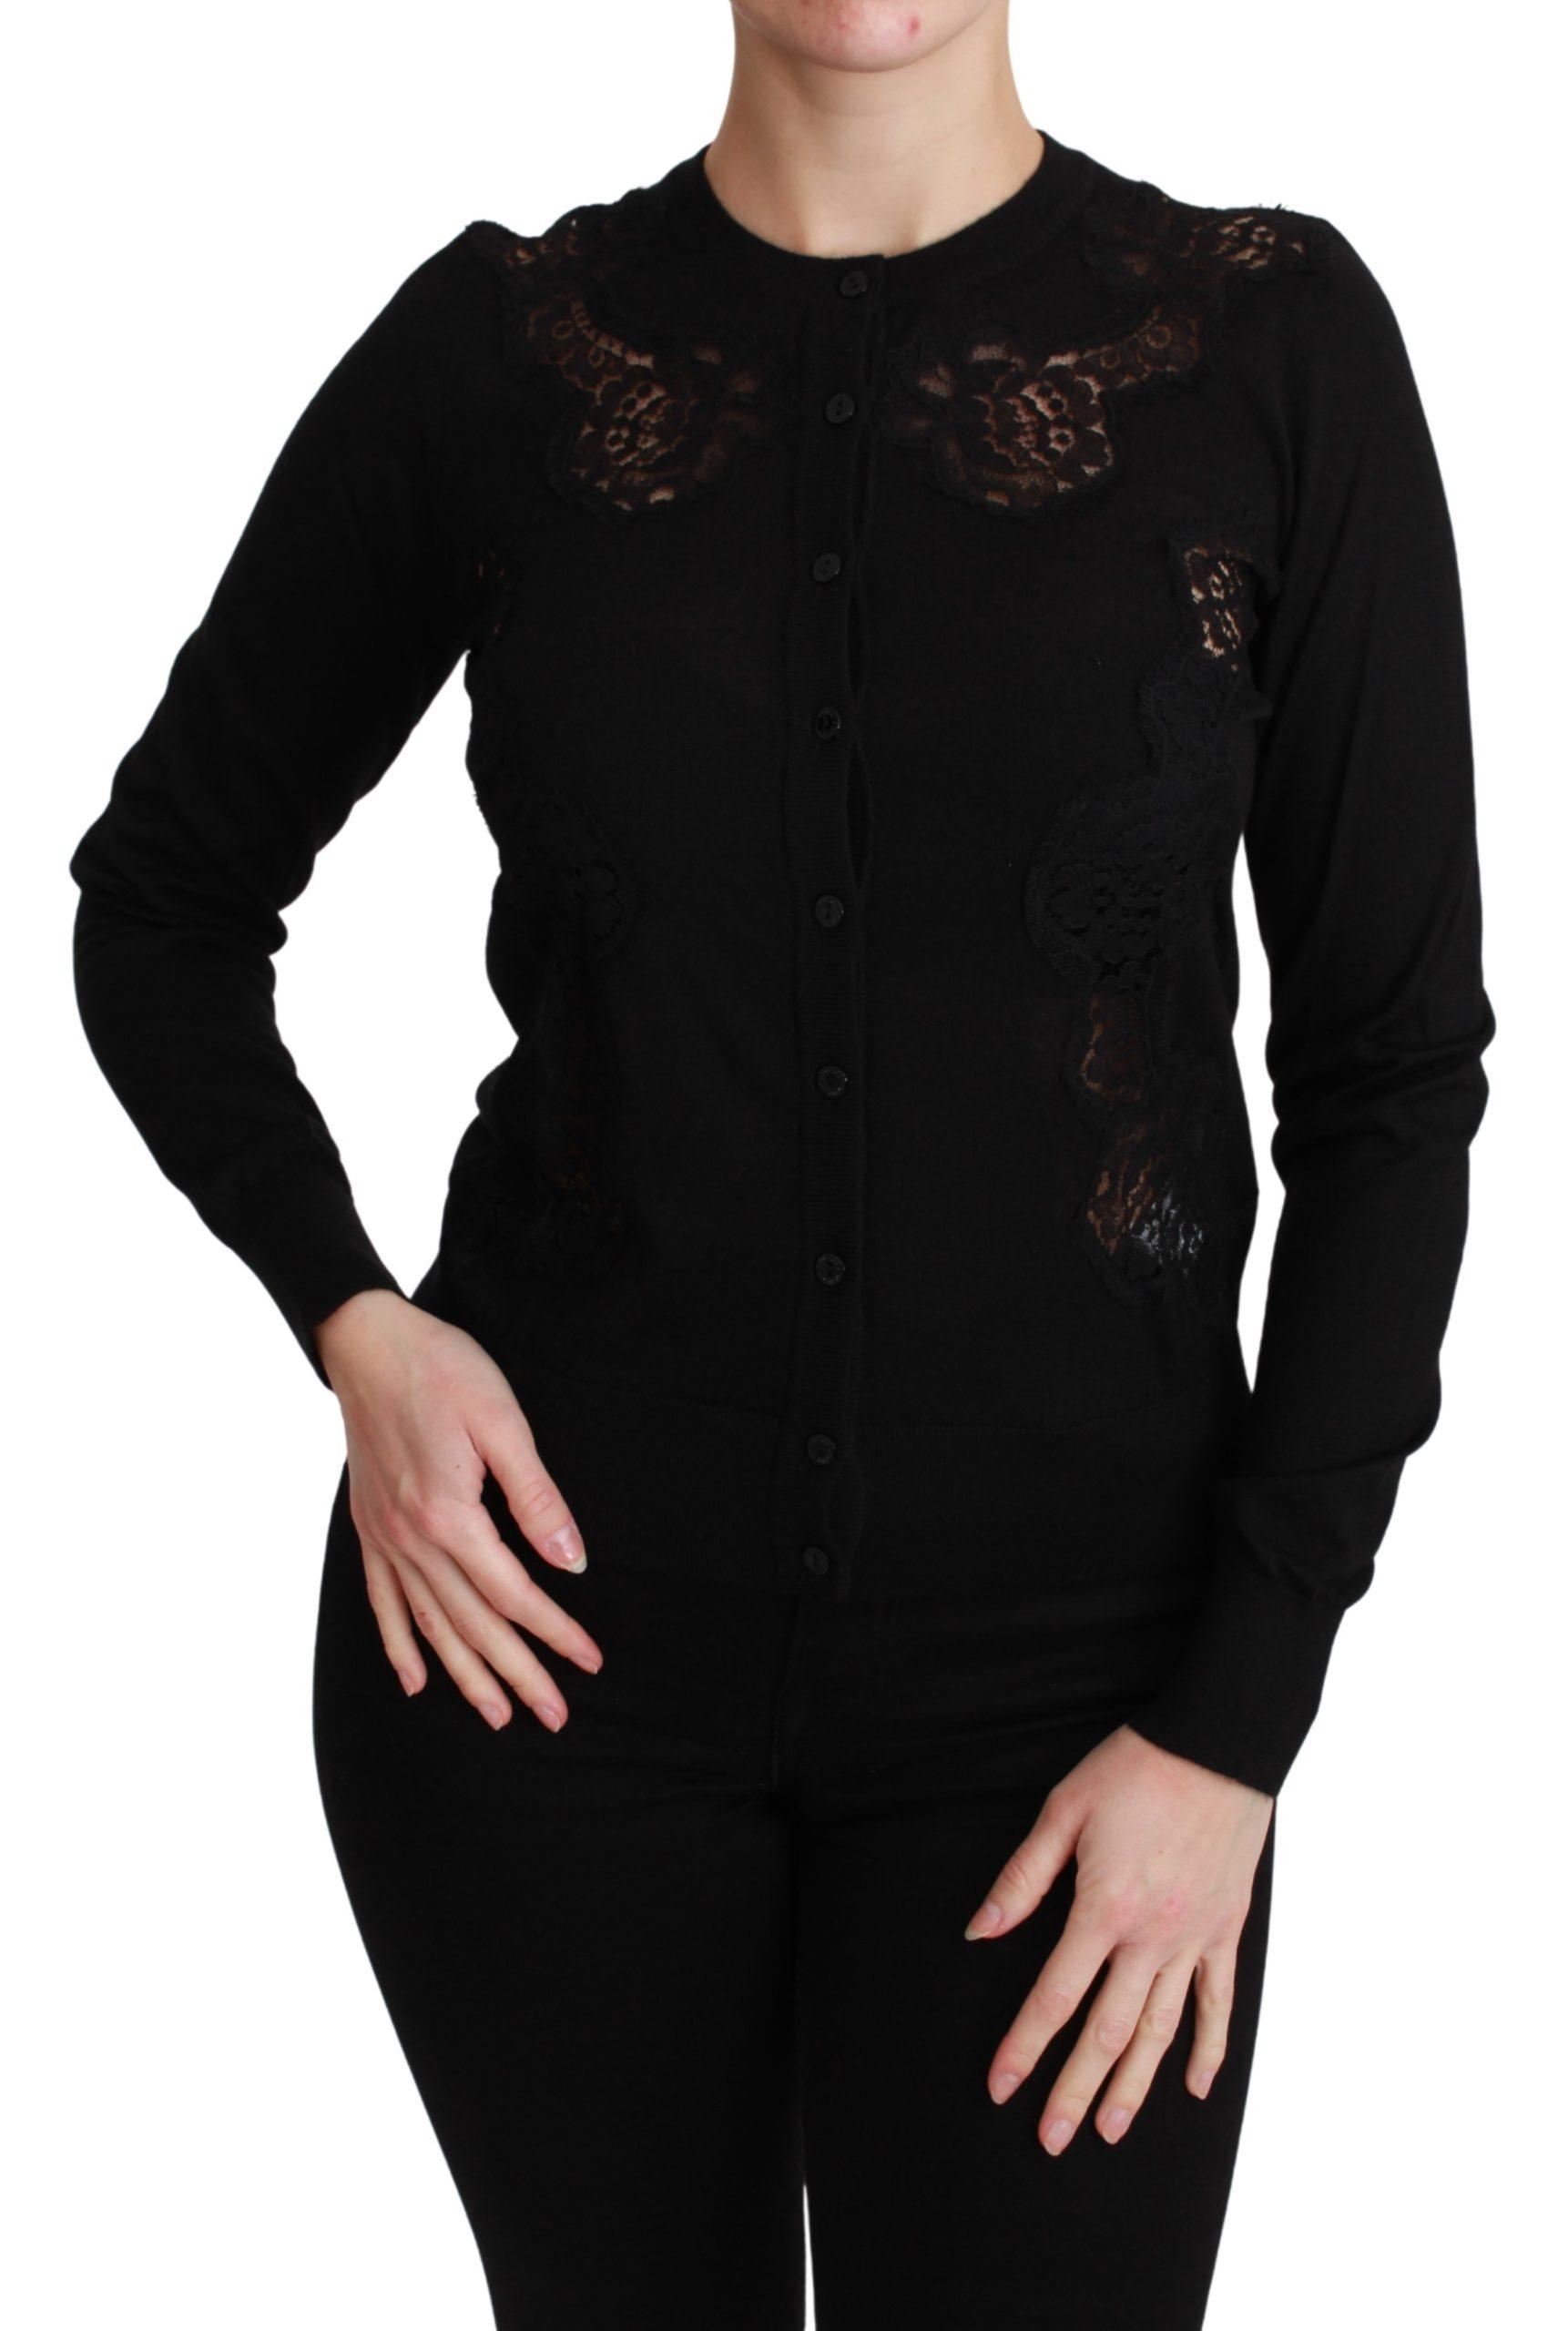 Dolce & Gabbana Women's Cashmere Lace Cardigan Black TSH4590 - IT36 | XS